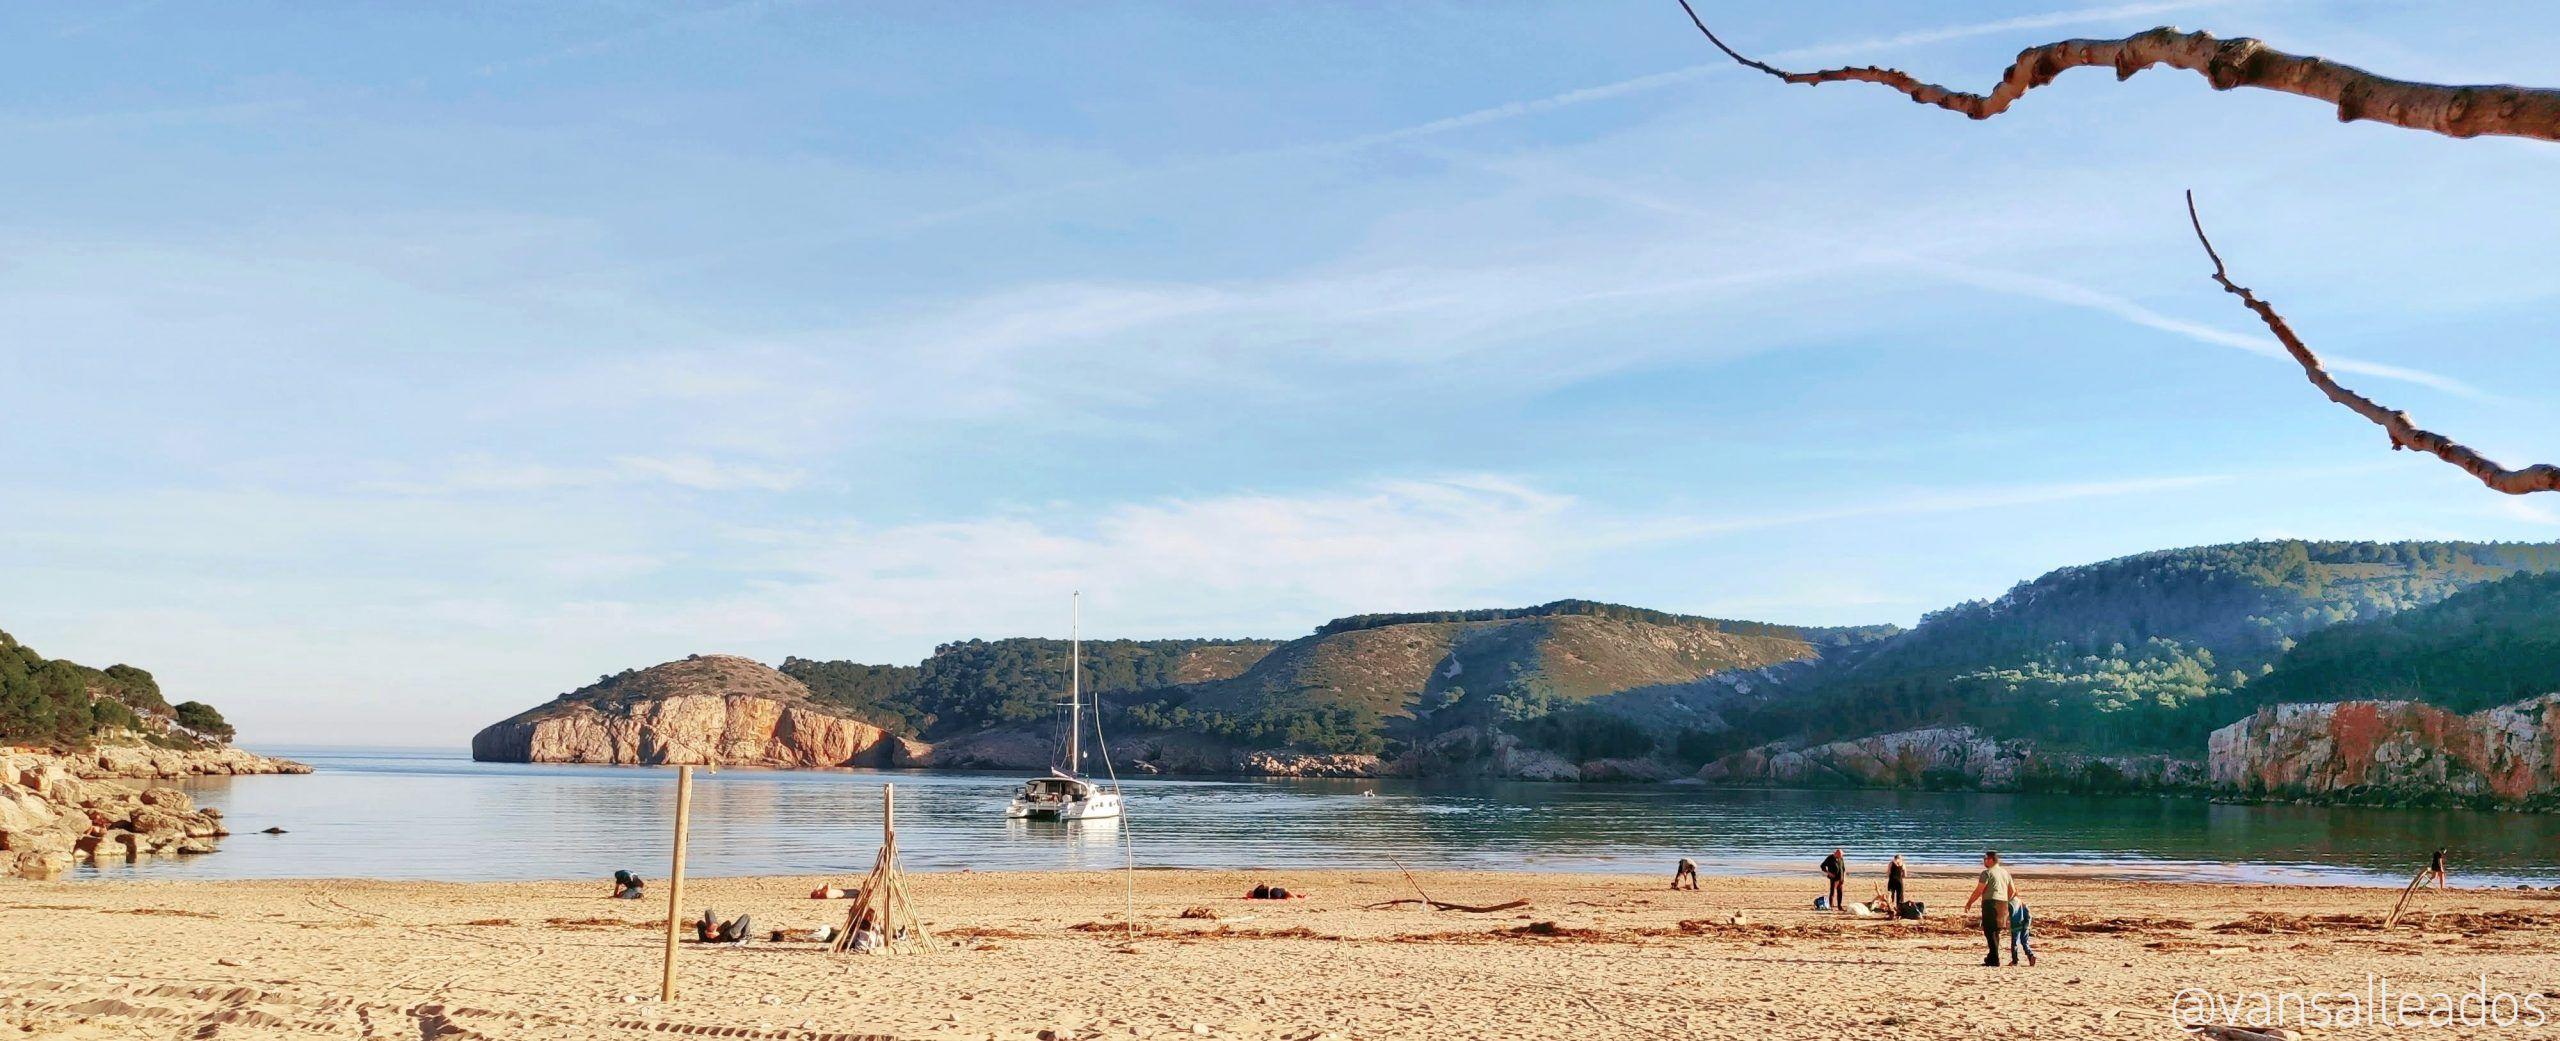 Playa Montgó, Cataluña